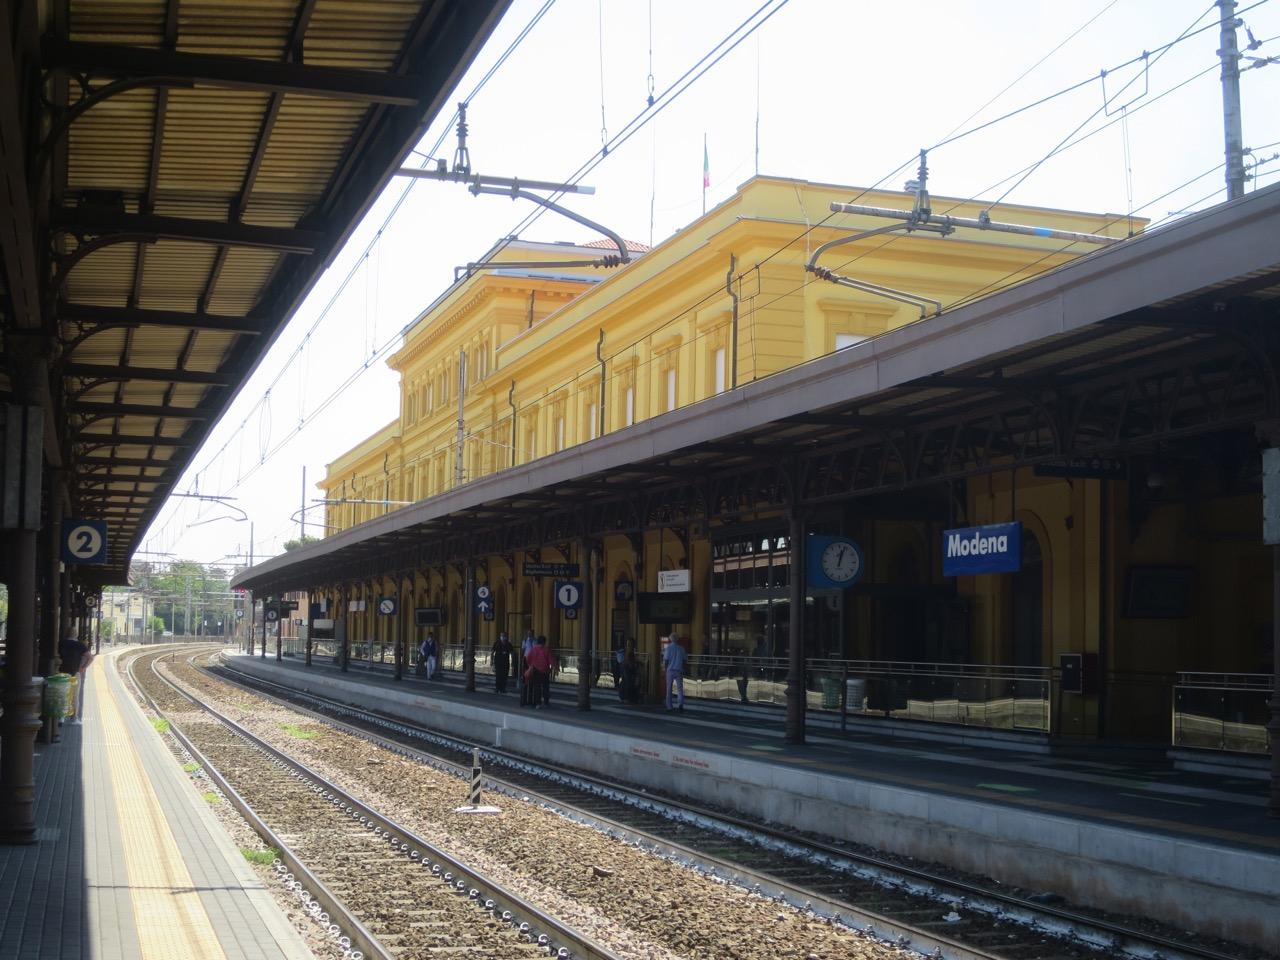 Modena 1 04